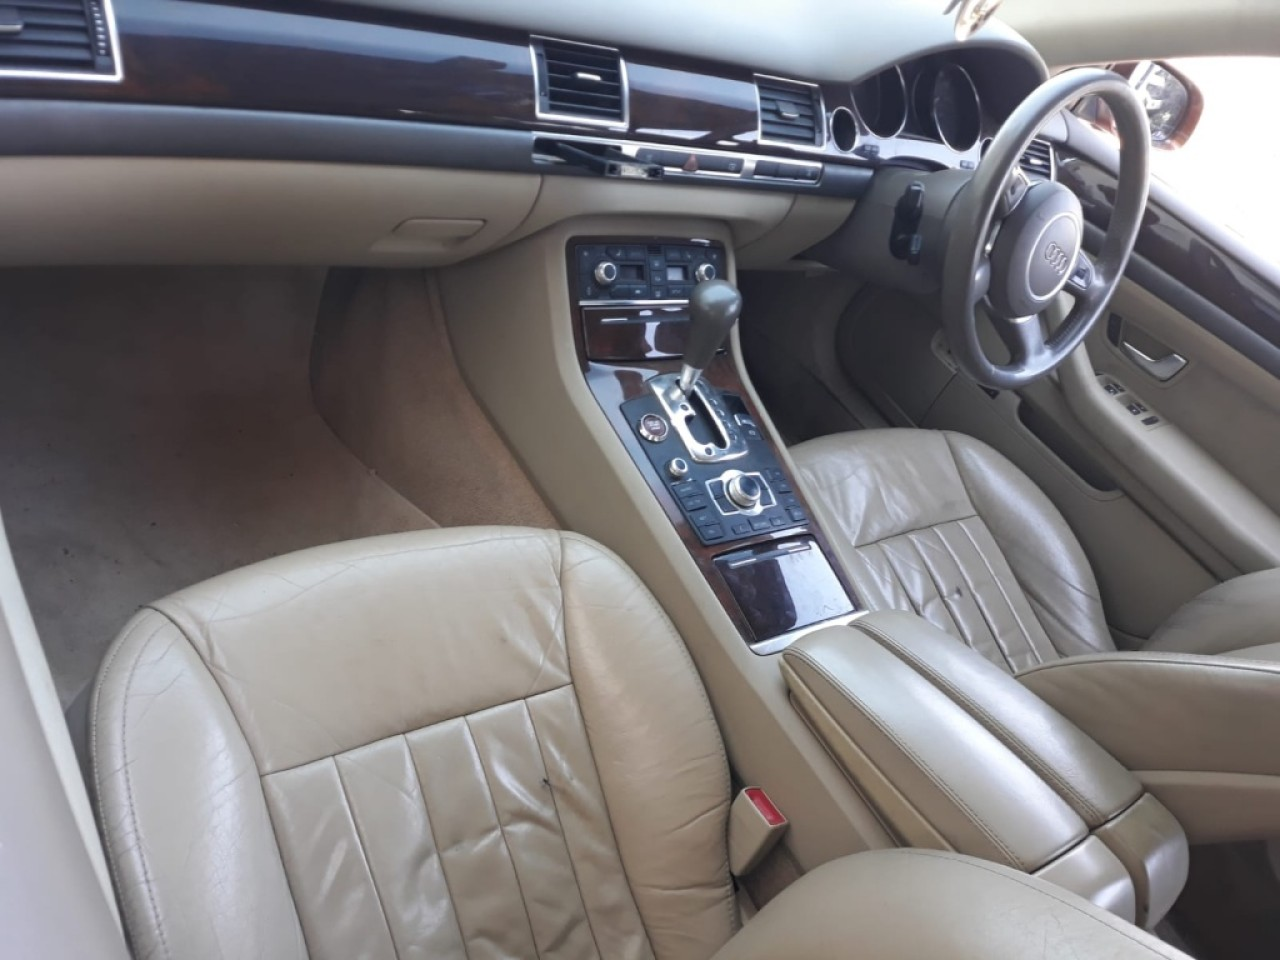 Consola centrala Audi A8 2004 berlina 3.0 benzina 220hp asn